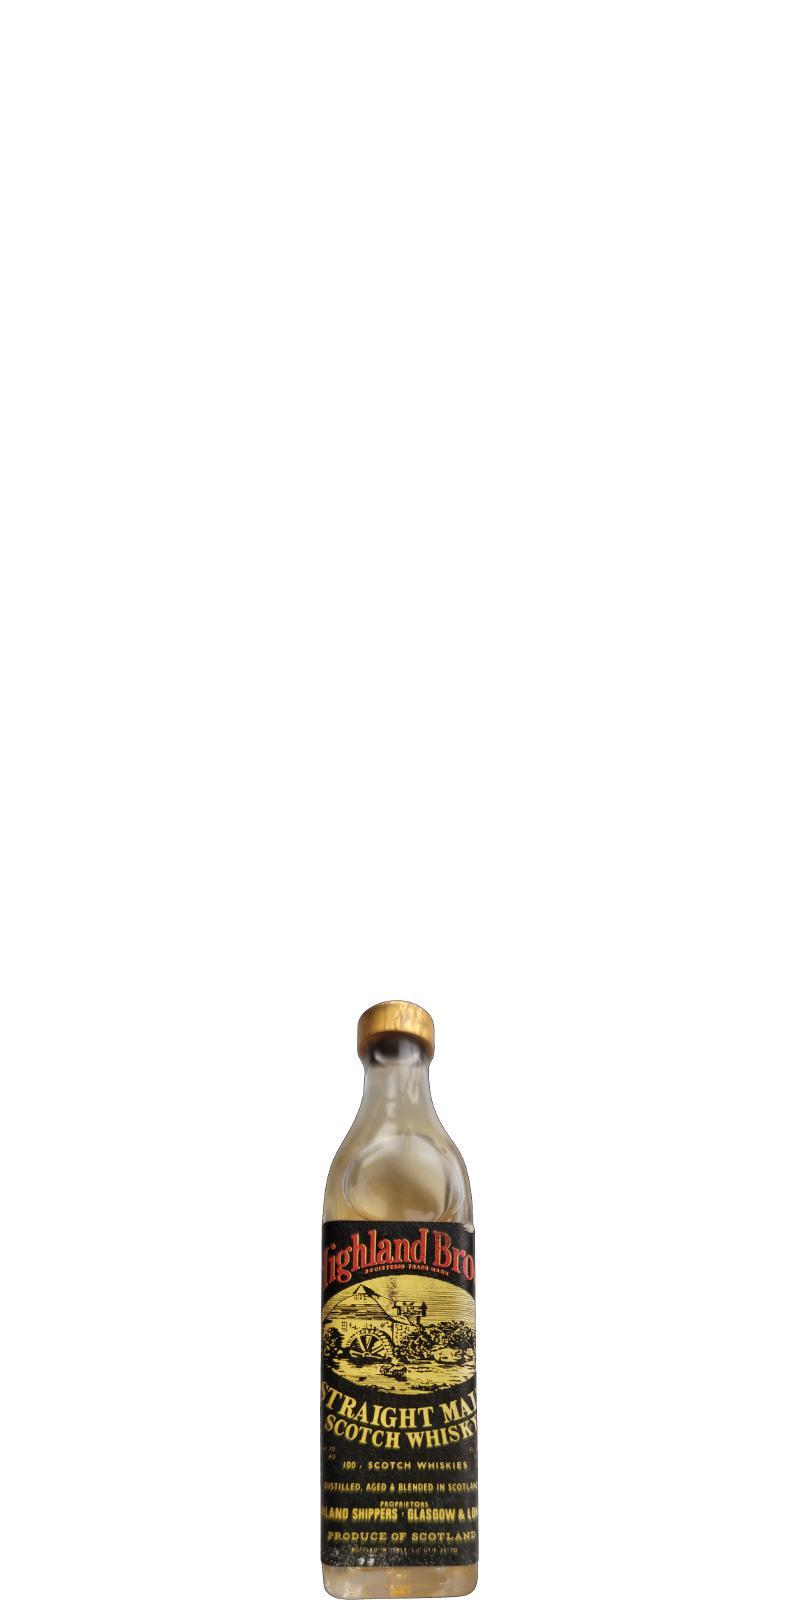 Lord Salisbury Straight Malt Scotch Whisky